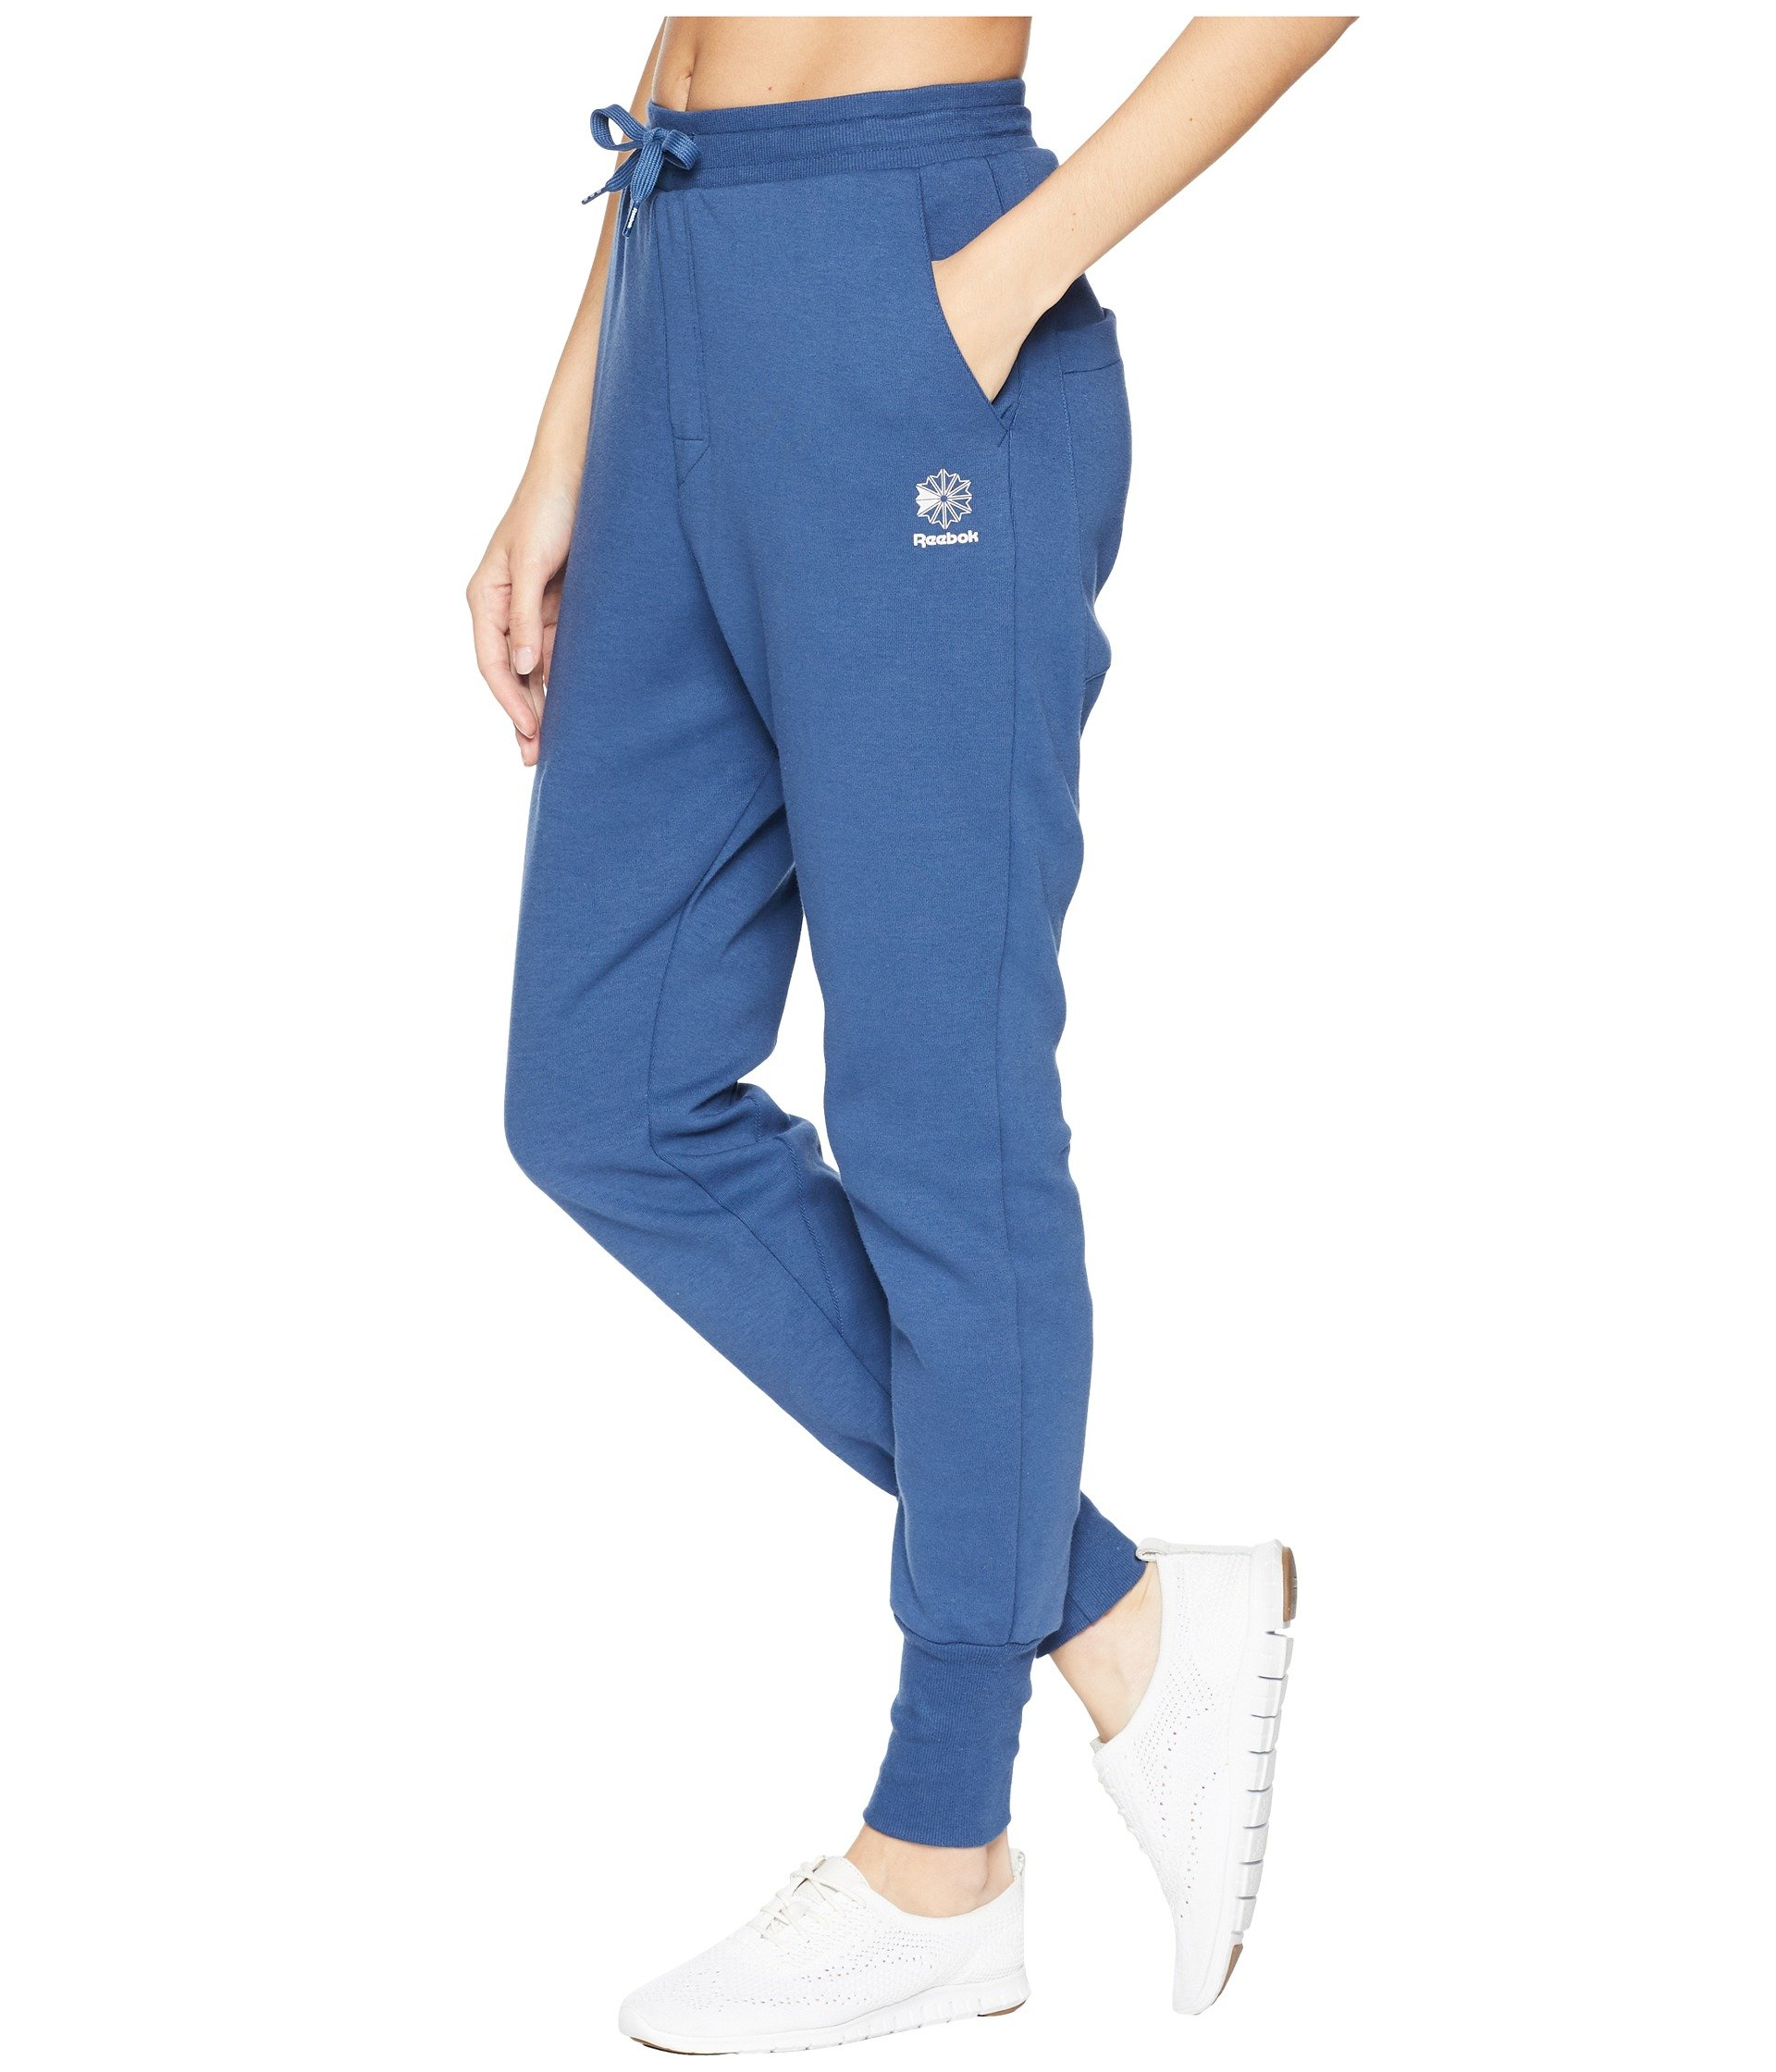 Blue Washed Classic Pants Reebok Dynamic UWnTxccAP